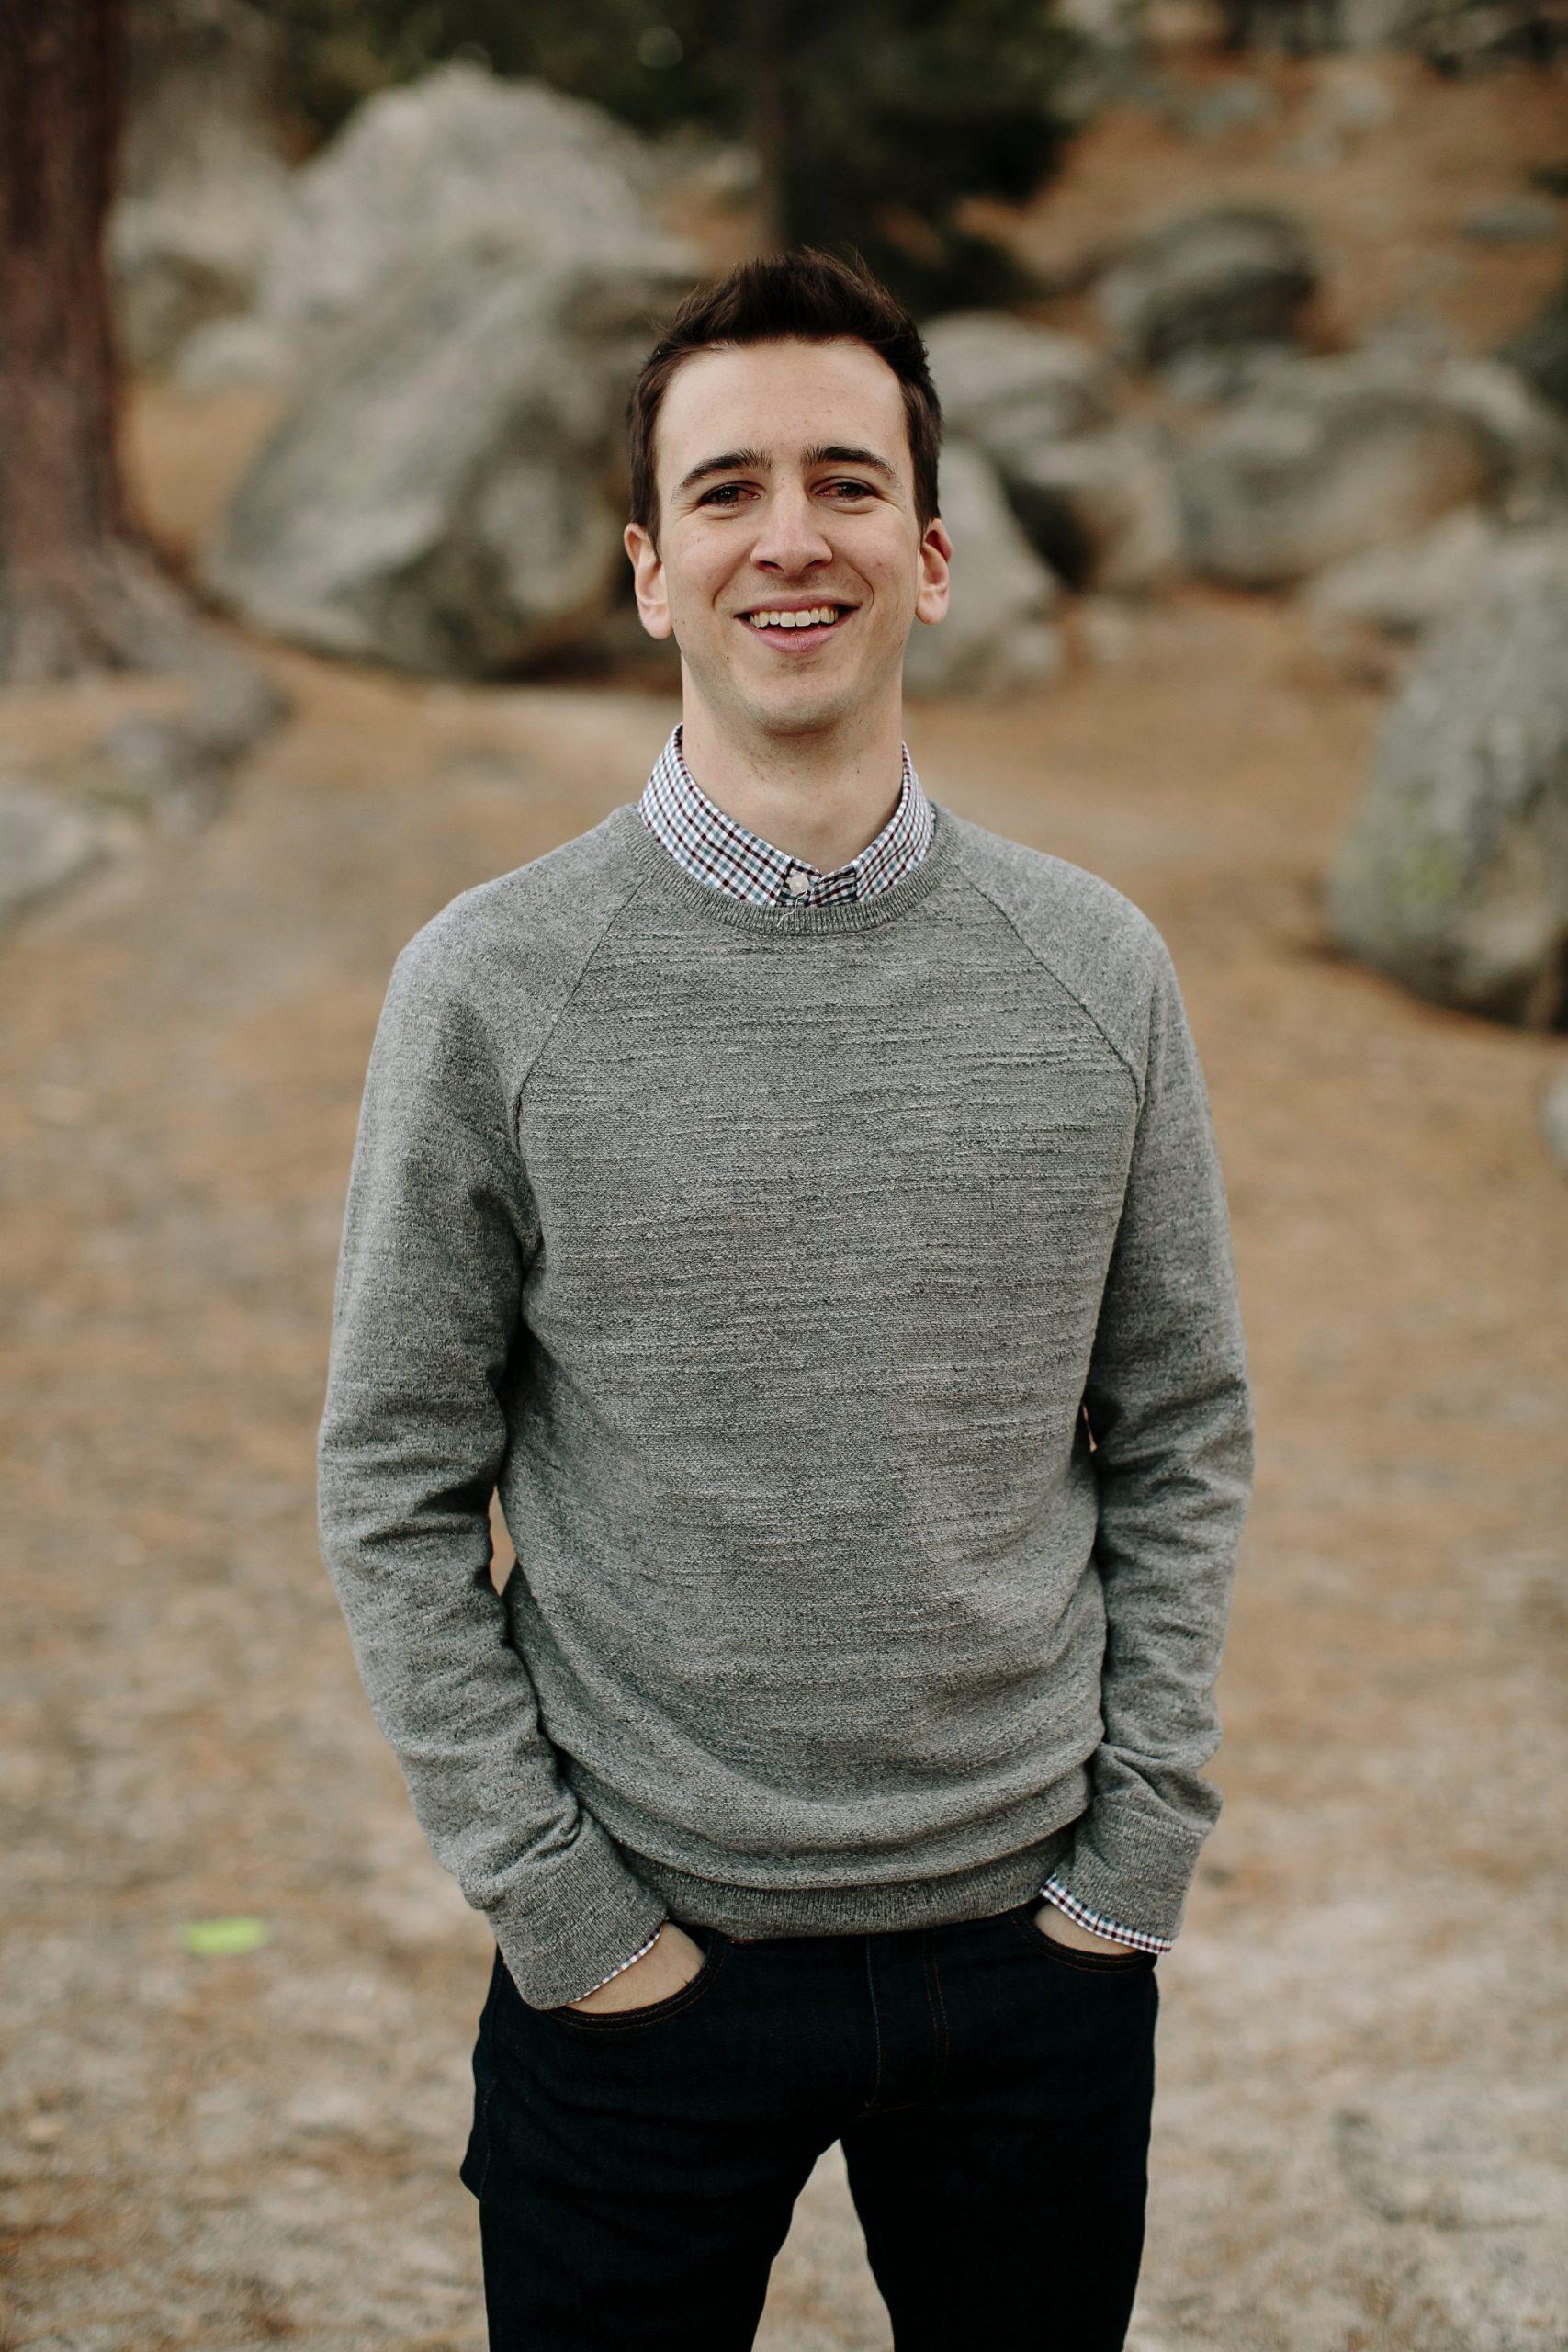 Introducing the Director of the Crucible, Matt Haupert!